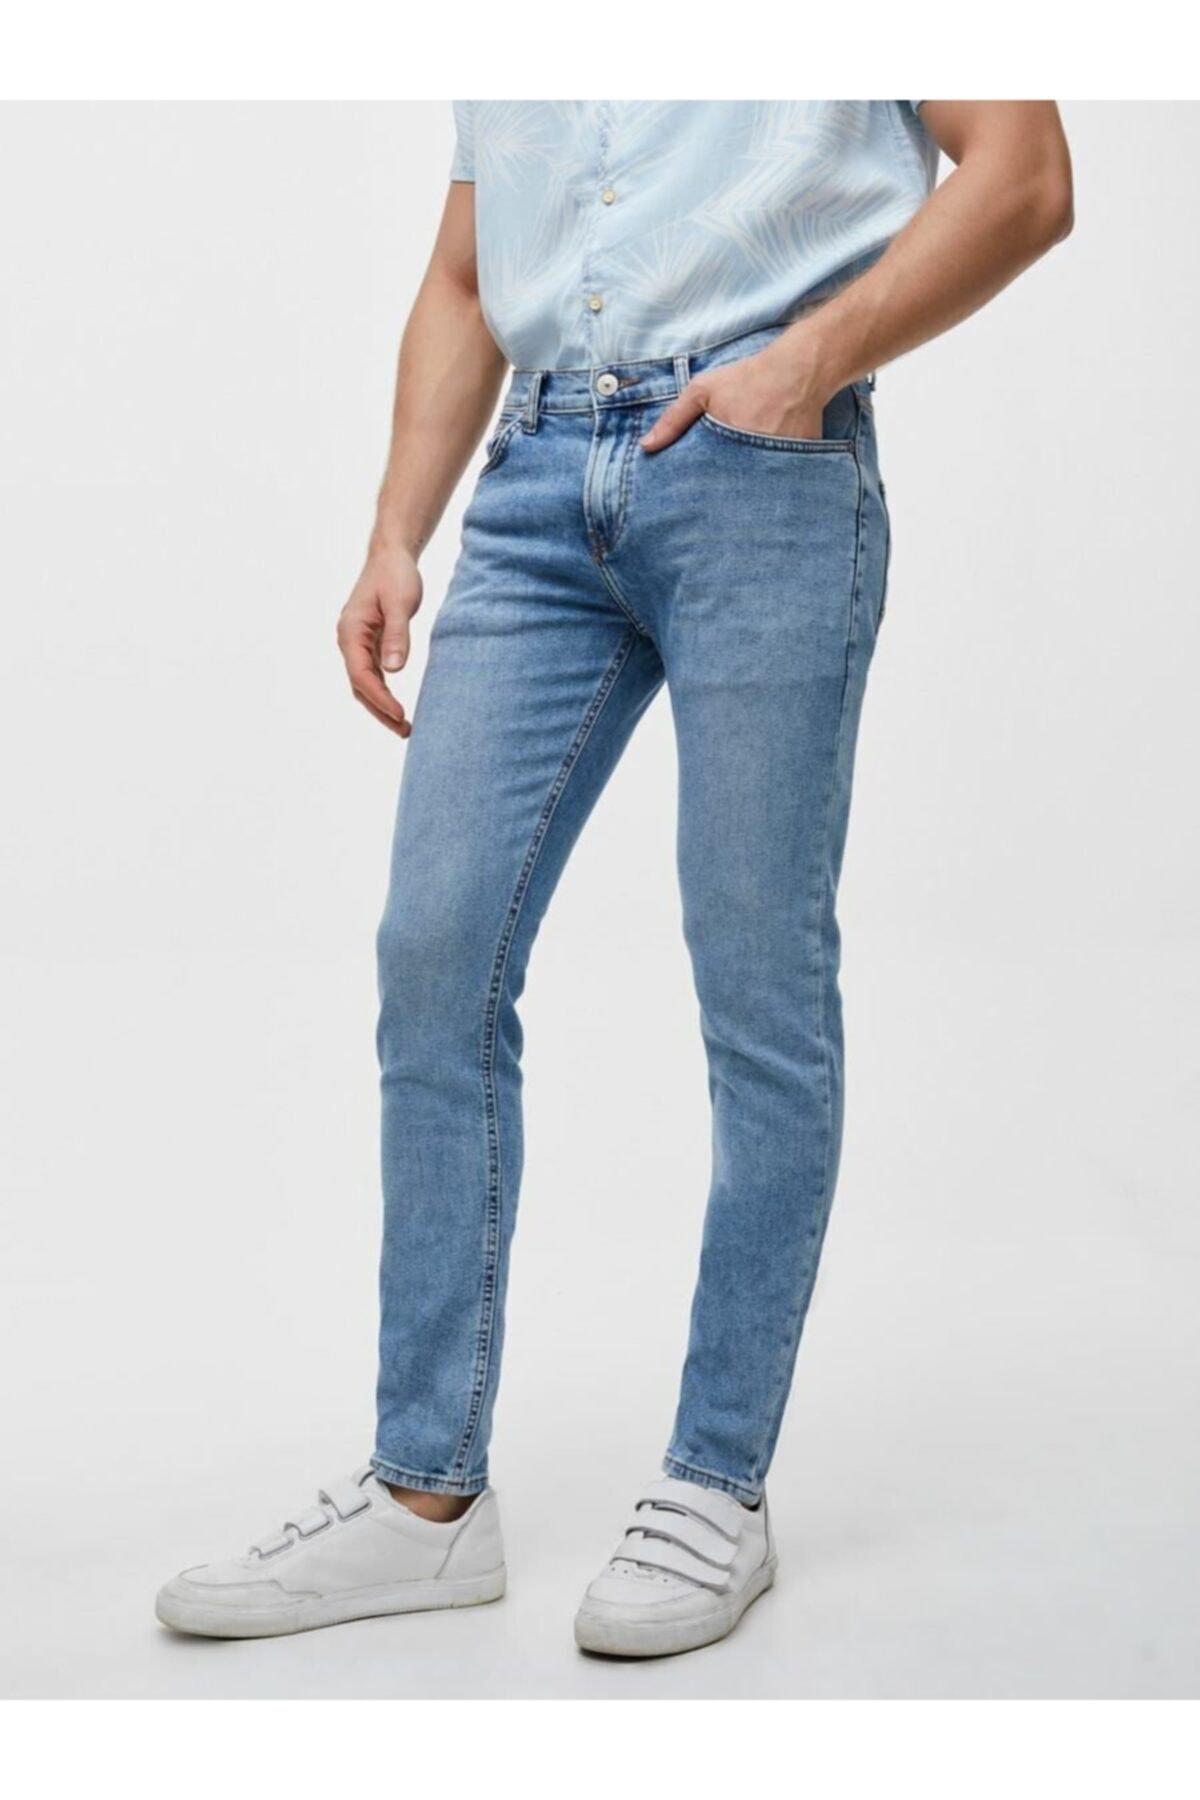 Ltb Erkek Smarty Sadly Wash Low Rise Super Skinny Kot Pantolon 1